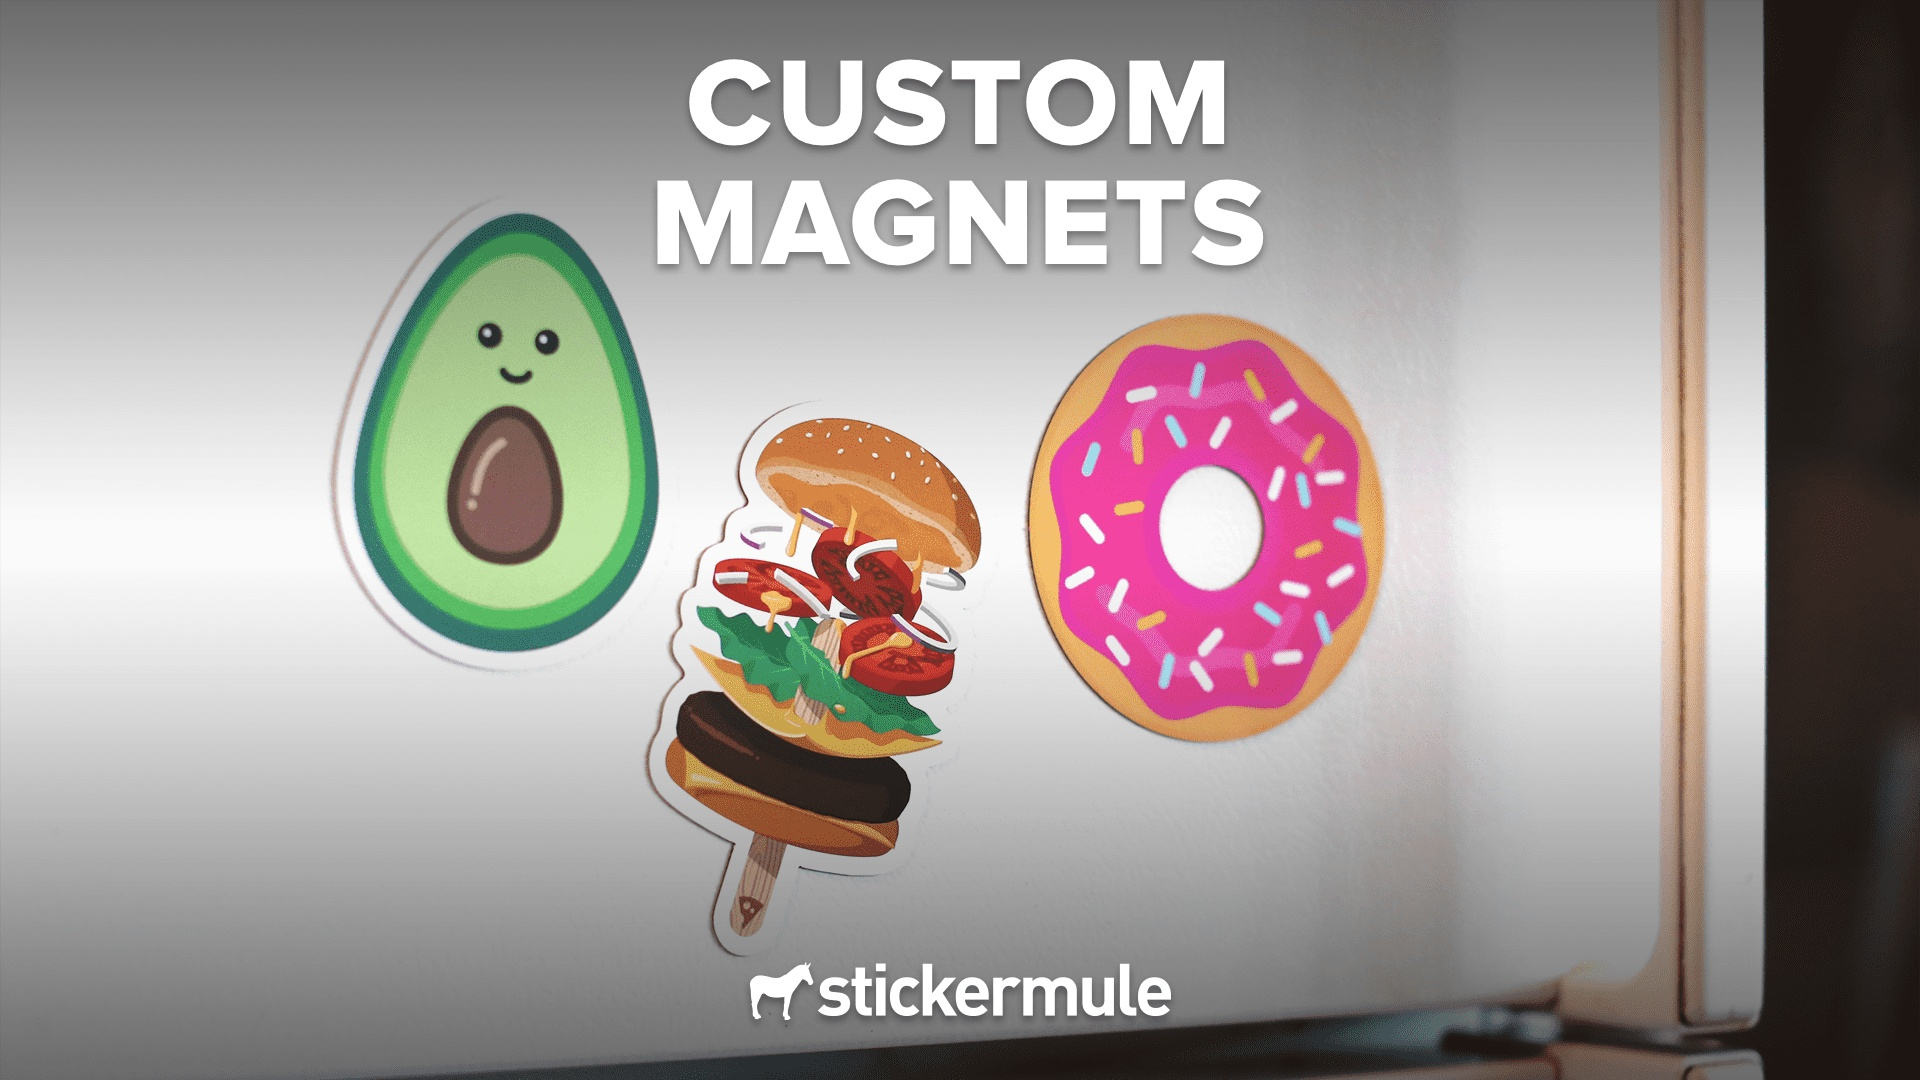 how to order custom